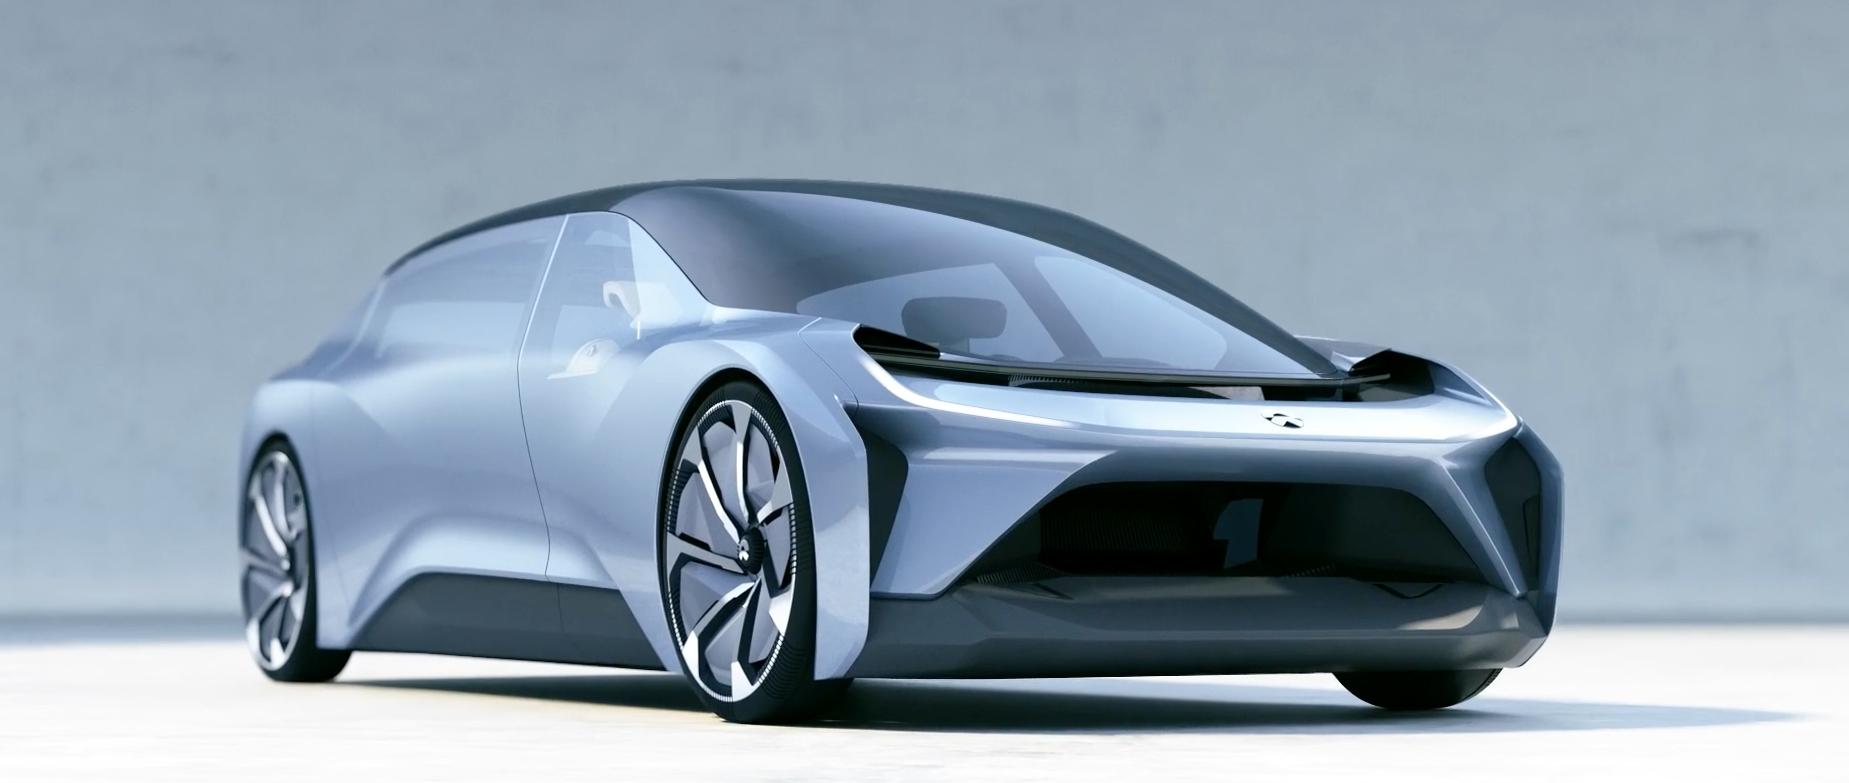 Nio Inc Electric Vehicle Maker Nio Eyes Listing Of New China Entity Auto News Et Auto